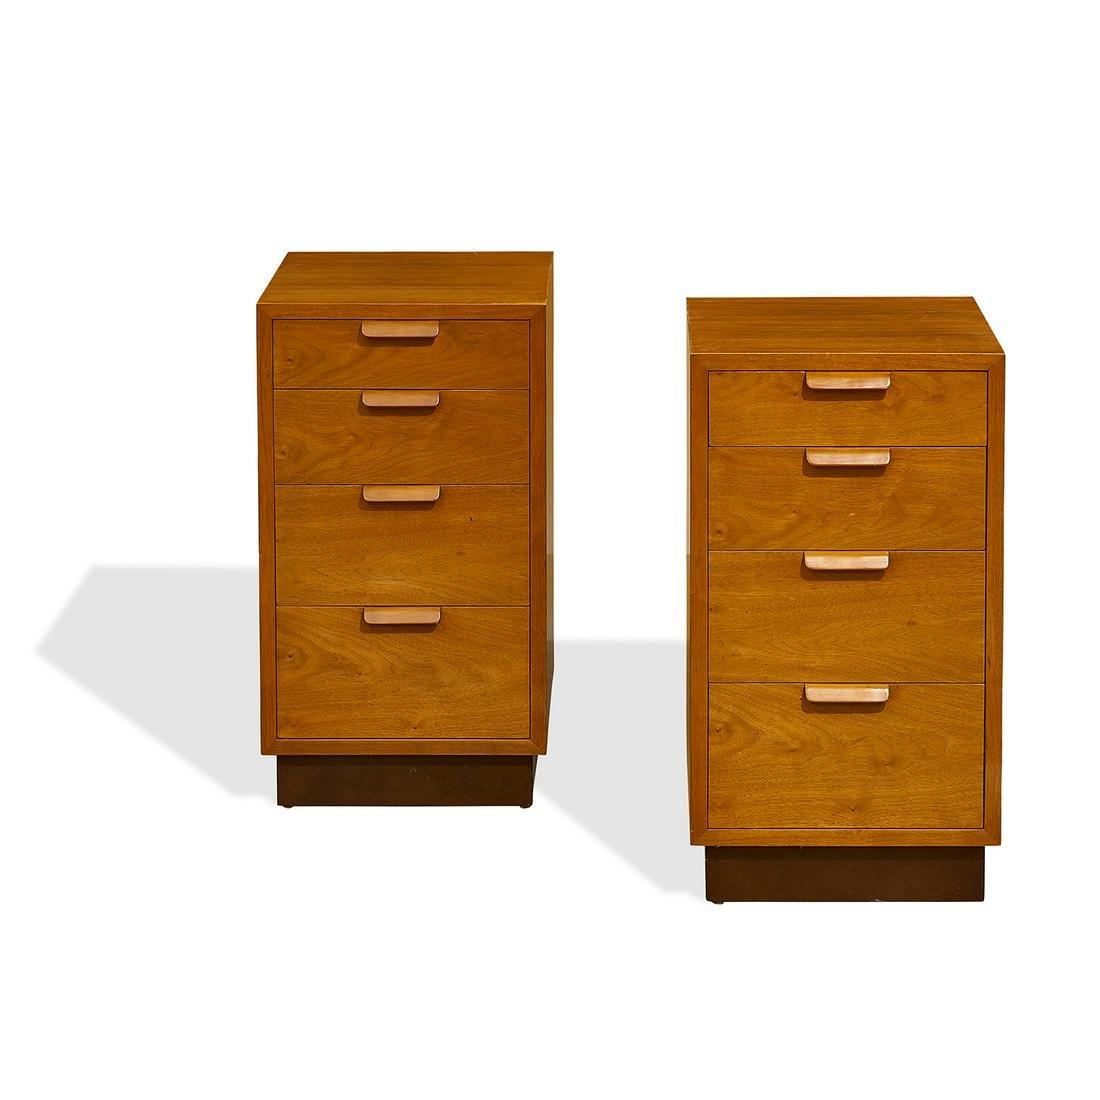 Edward Wormley for Dunbar nightstands, pair